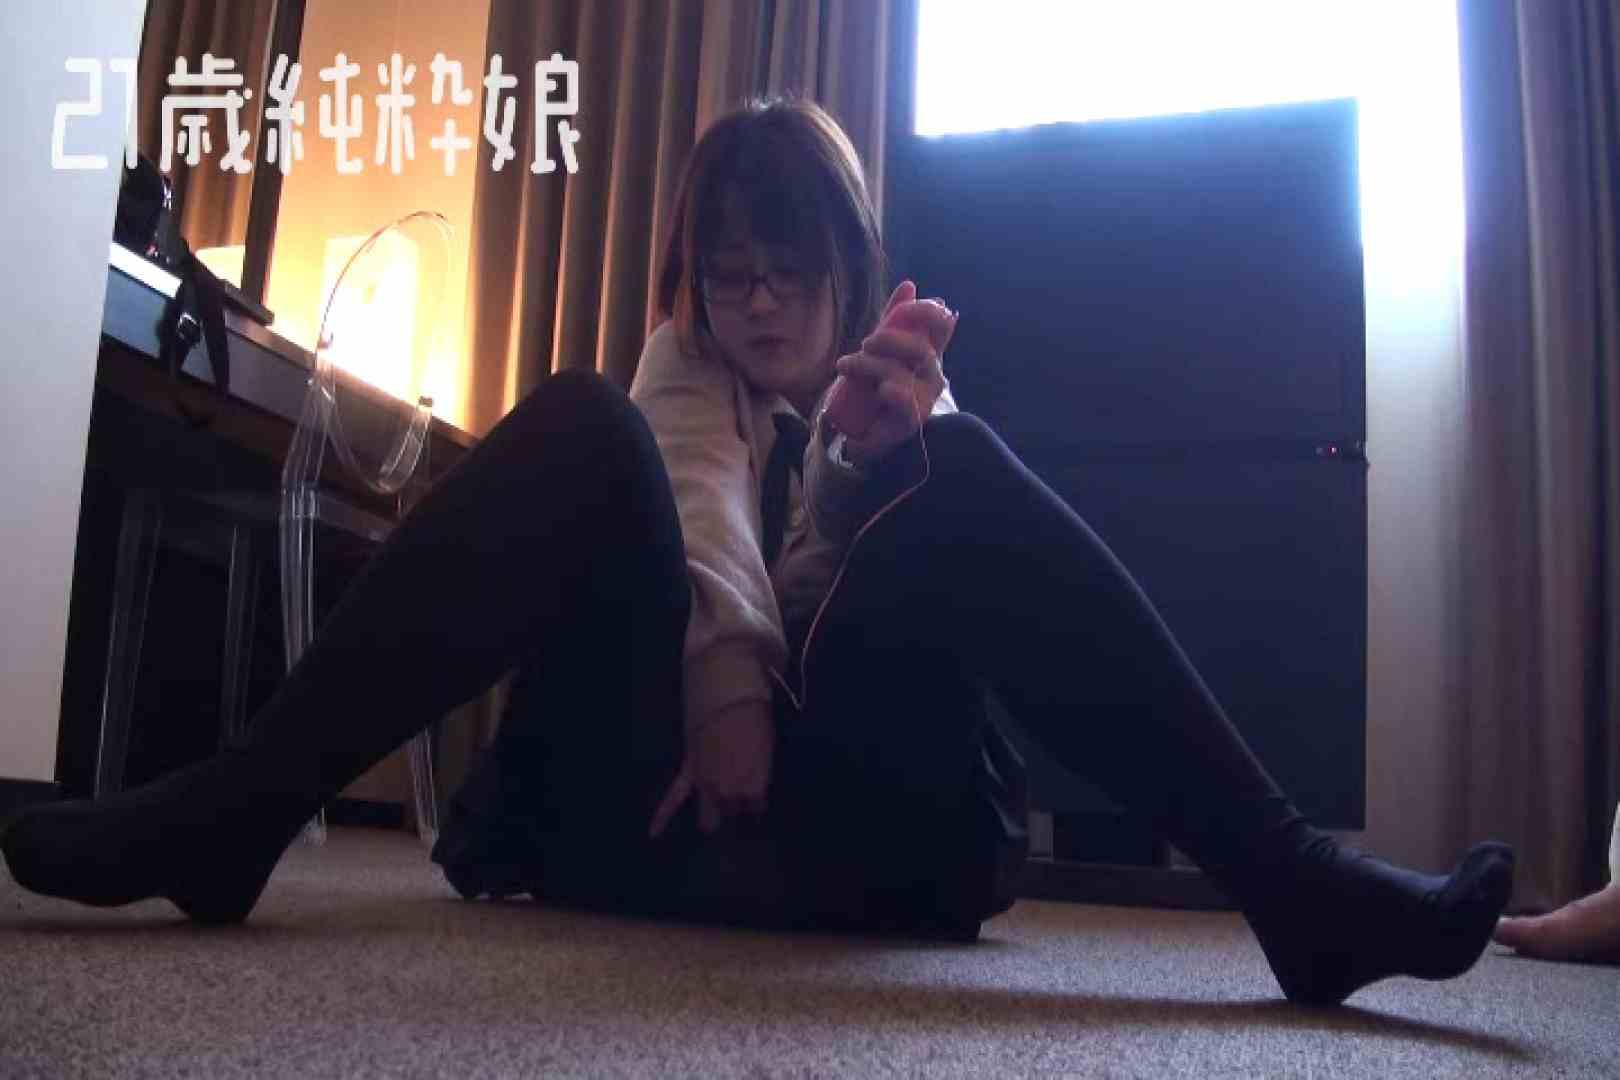 Gカップ21歳純粋嬢第2弾Vol.3 一般投稿 オマンコ動画キャプチャ 50pic 2